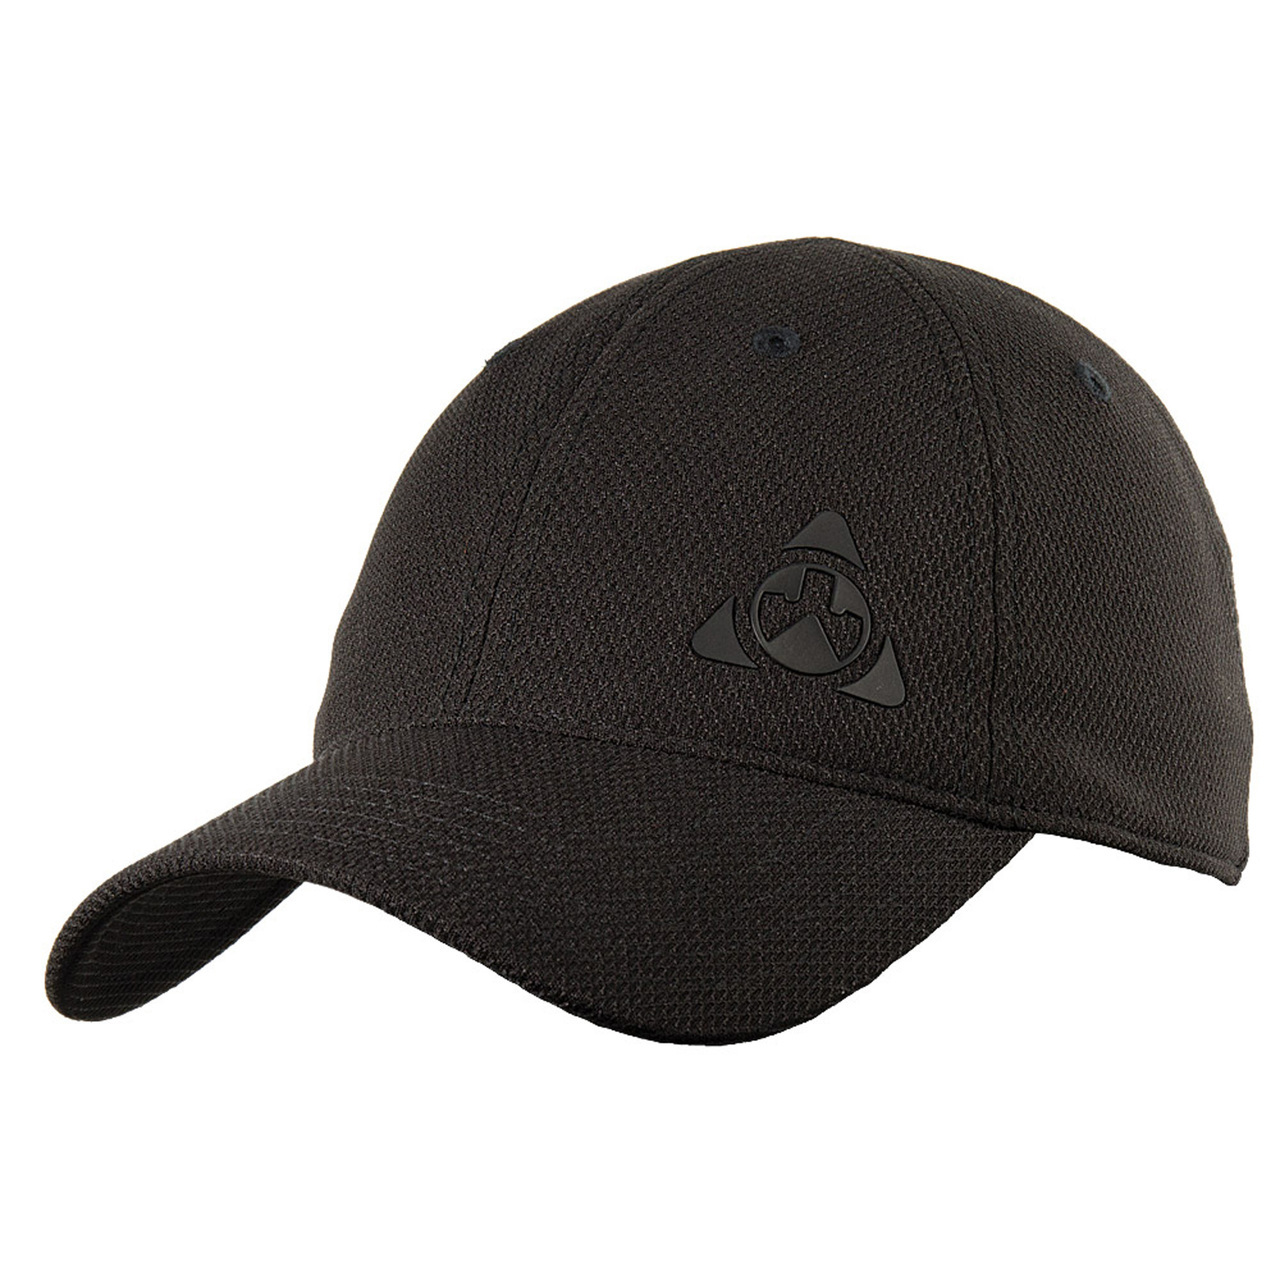 Magpul Core Cover Ballcap S/M Black